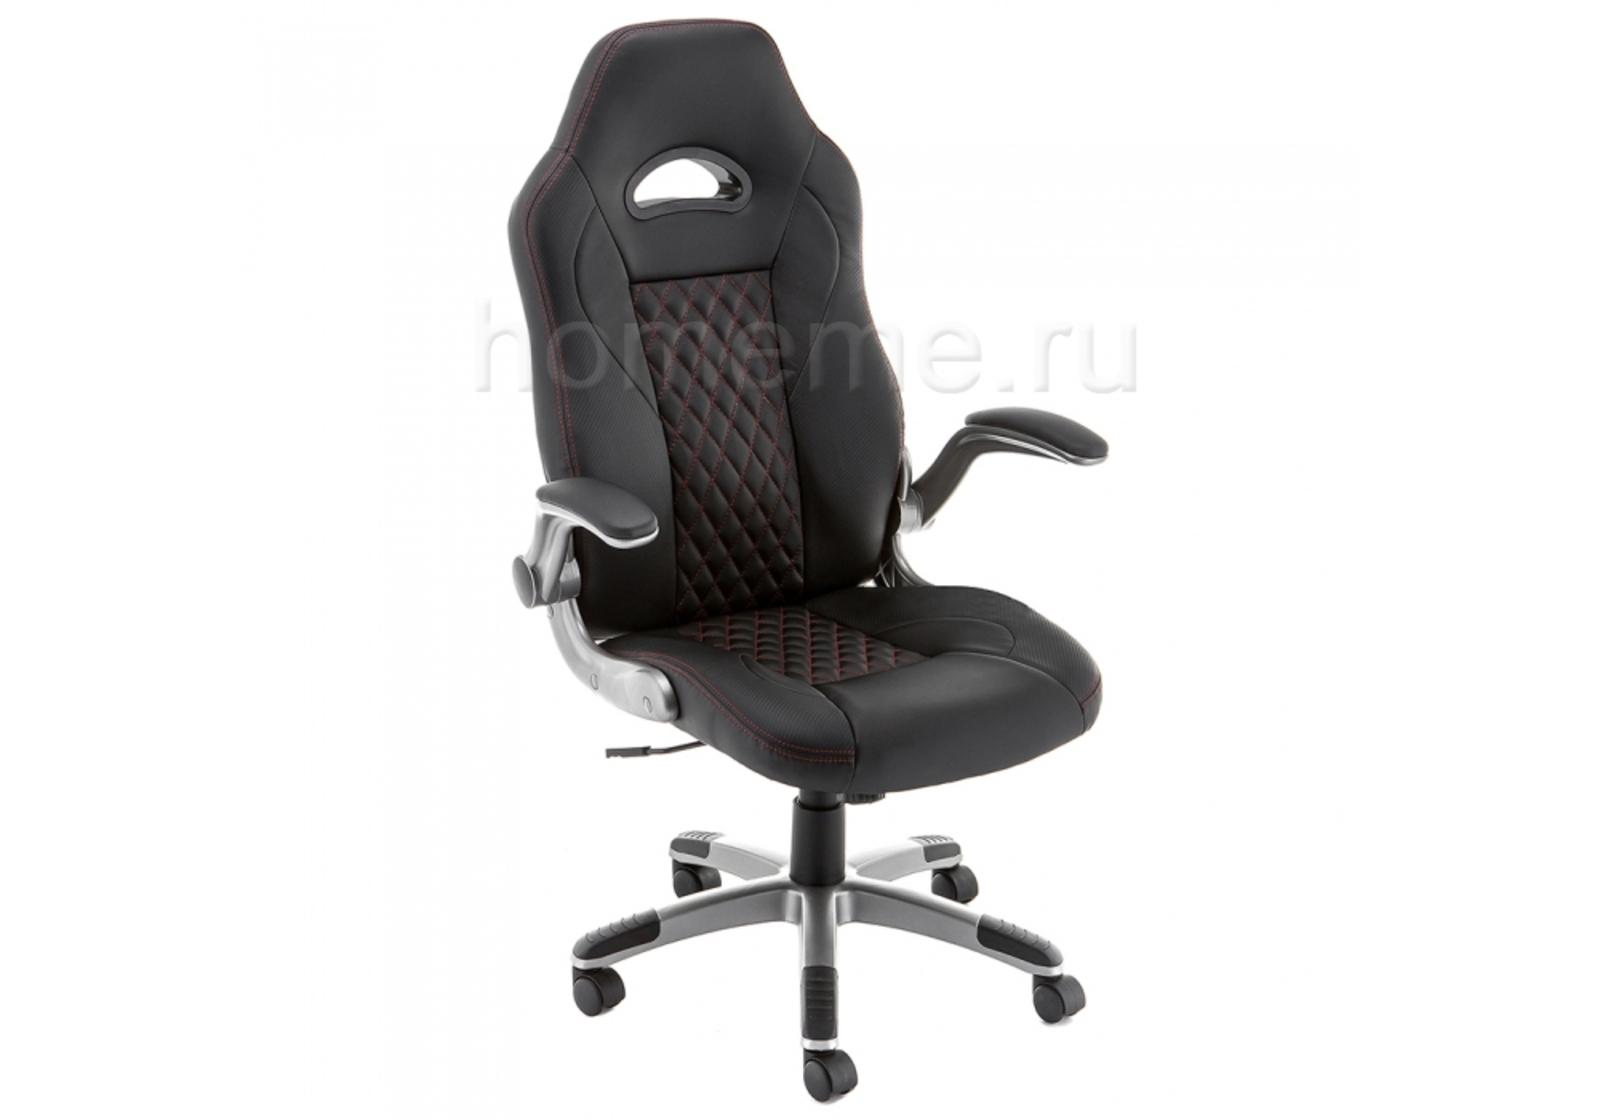 Кресло для офиса HomeMe Kan черное 11263 от Homeme.ru